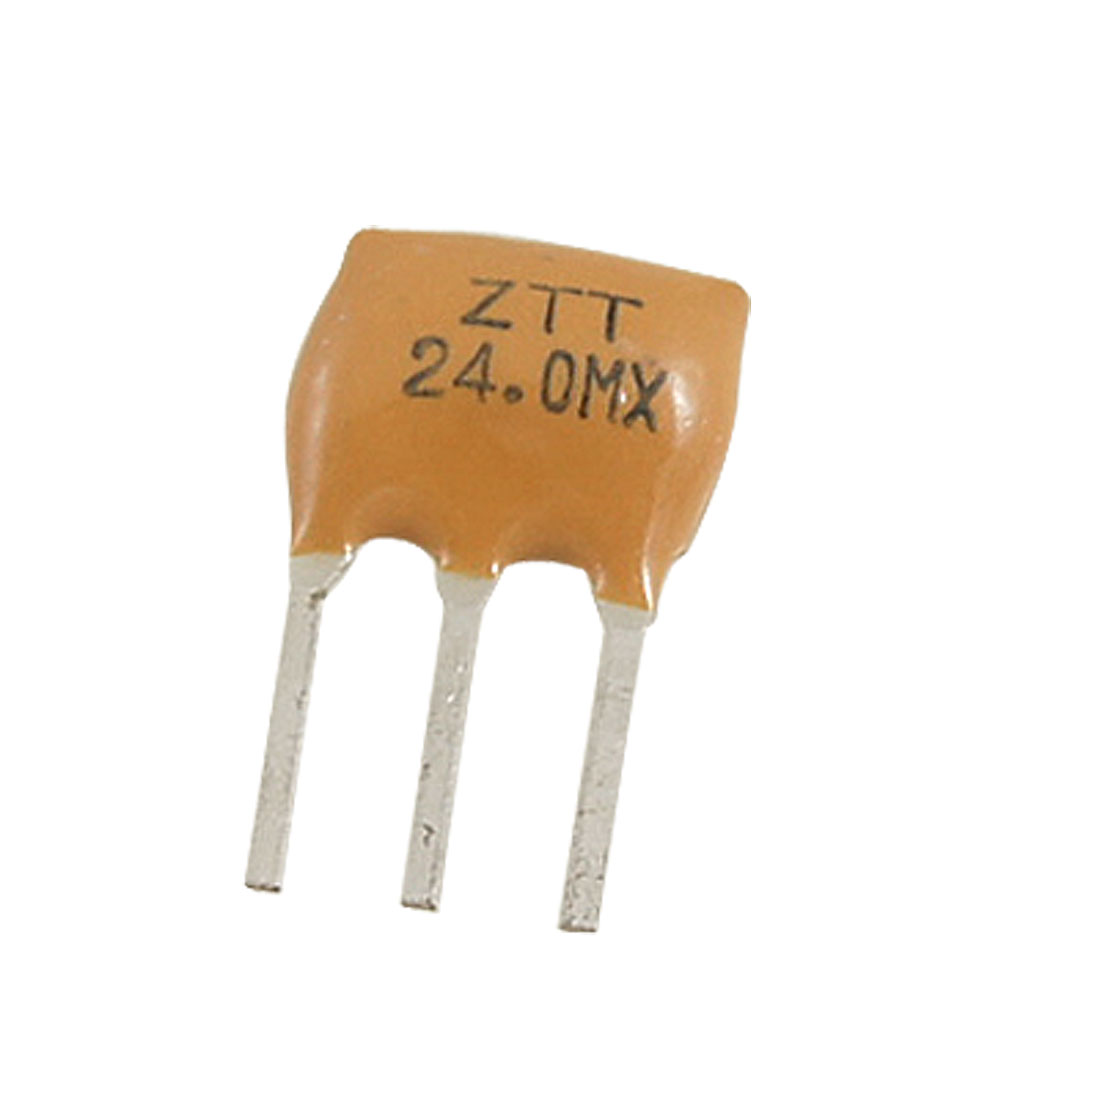 5Pcs Ceramic Filters Crystal Resonators 3 Pin 24.000MHz